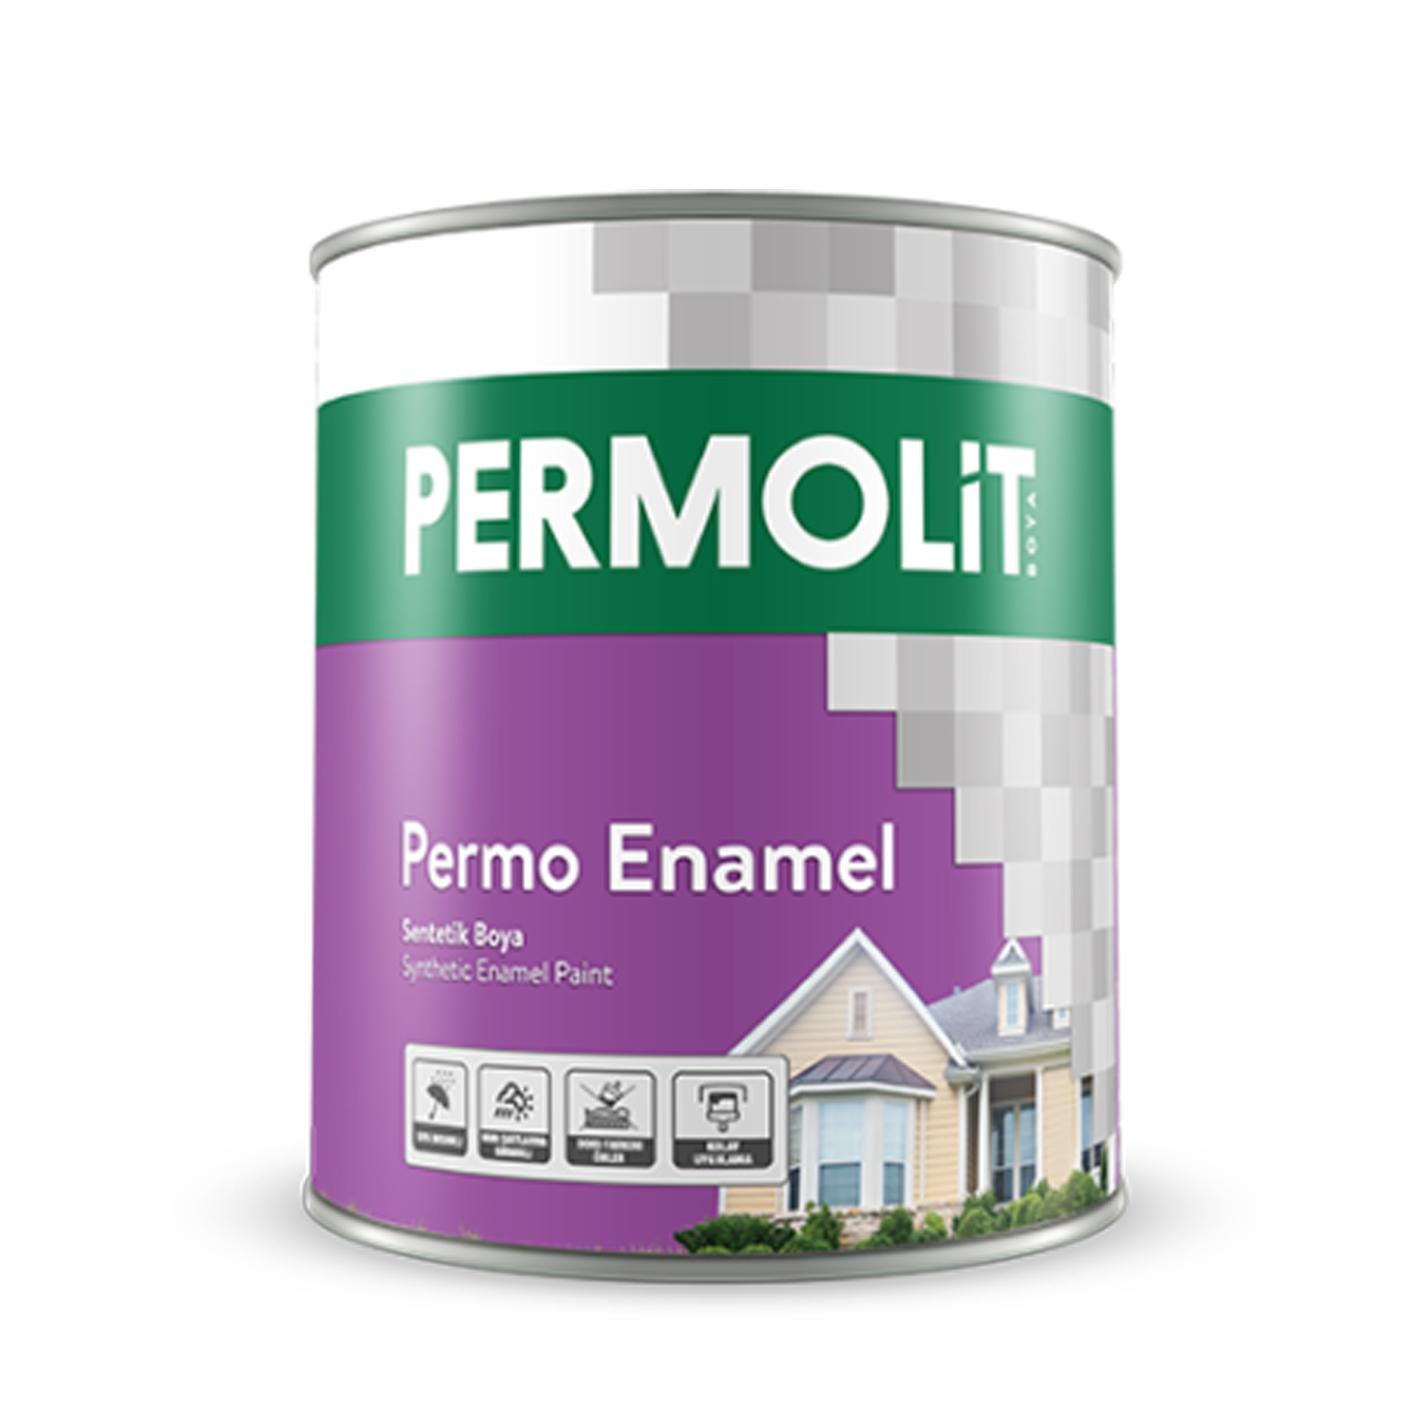 Permolit Permo Enamel Sentetik Krem 0.75Lt